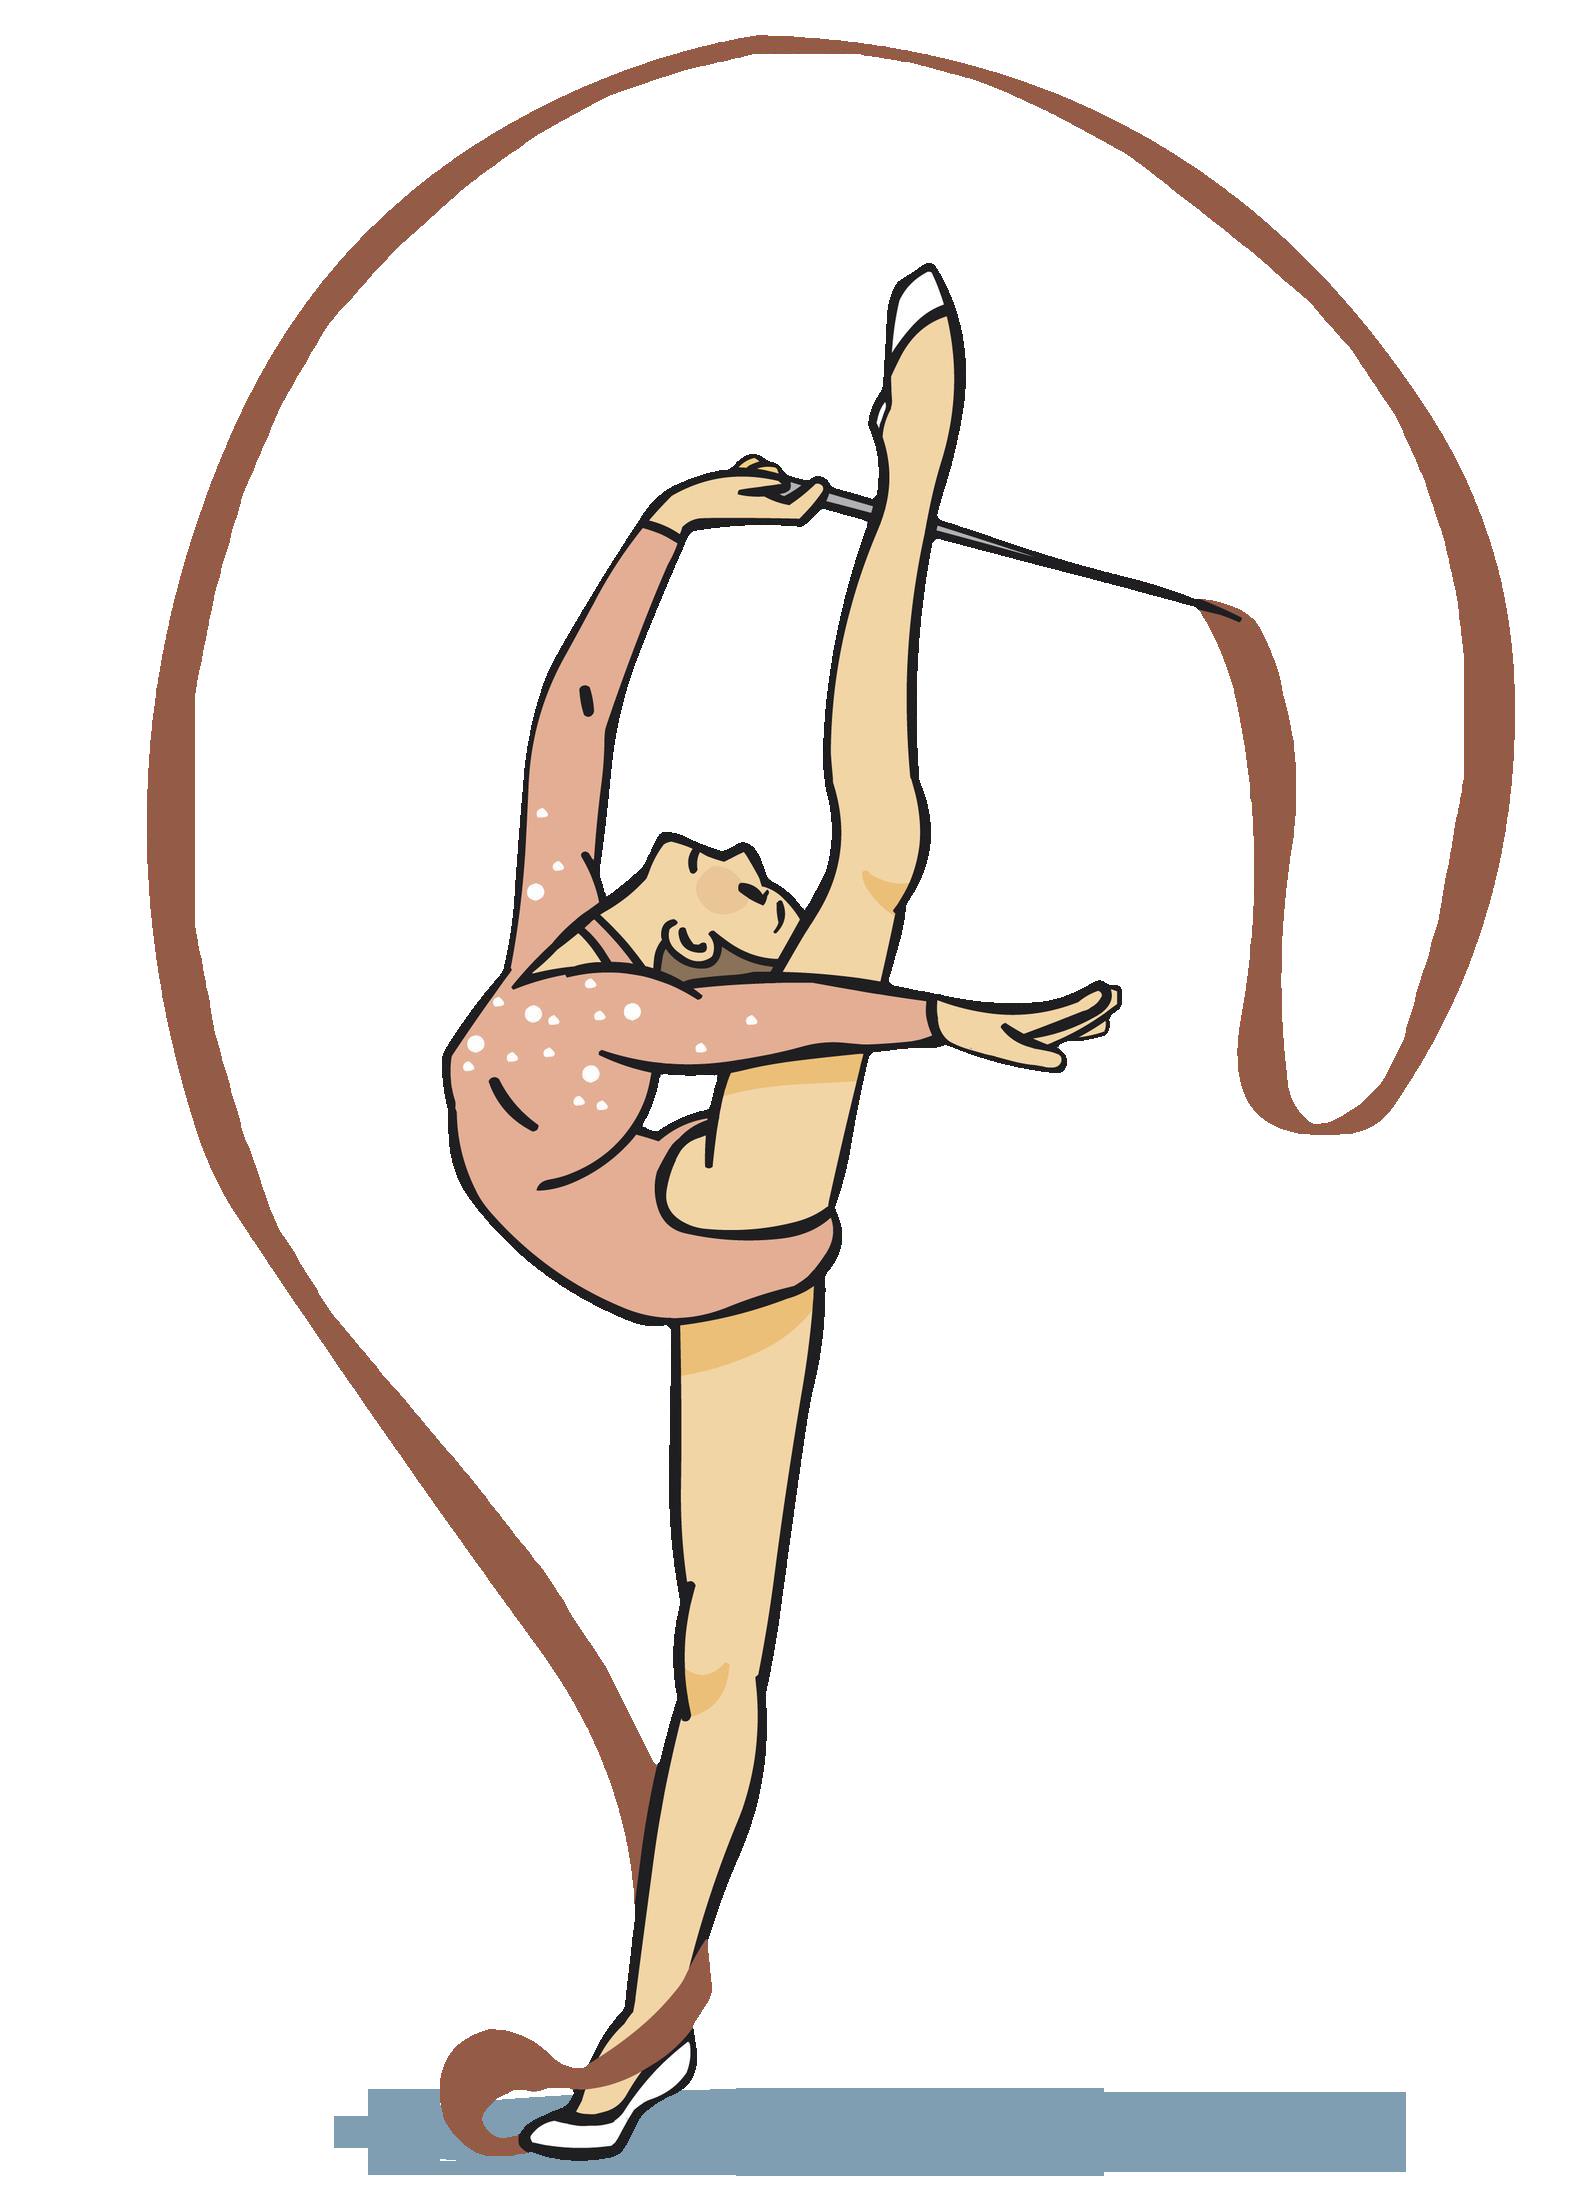 Gymnastics person balance